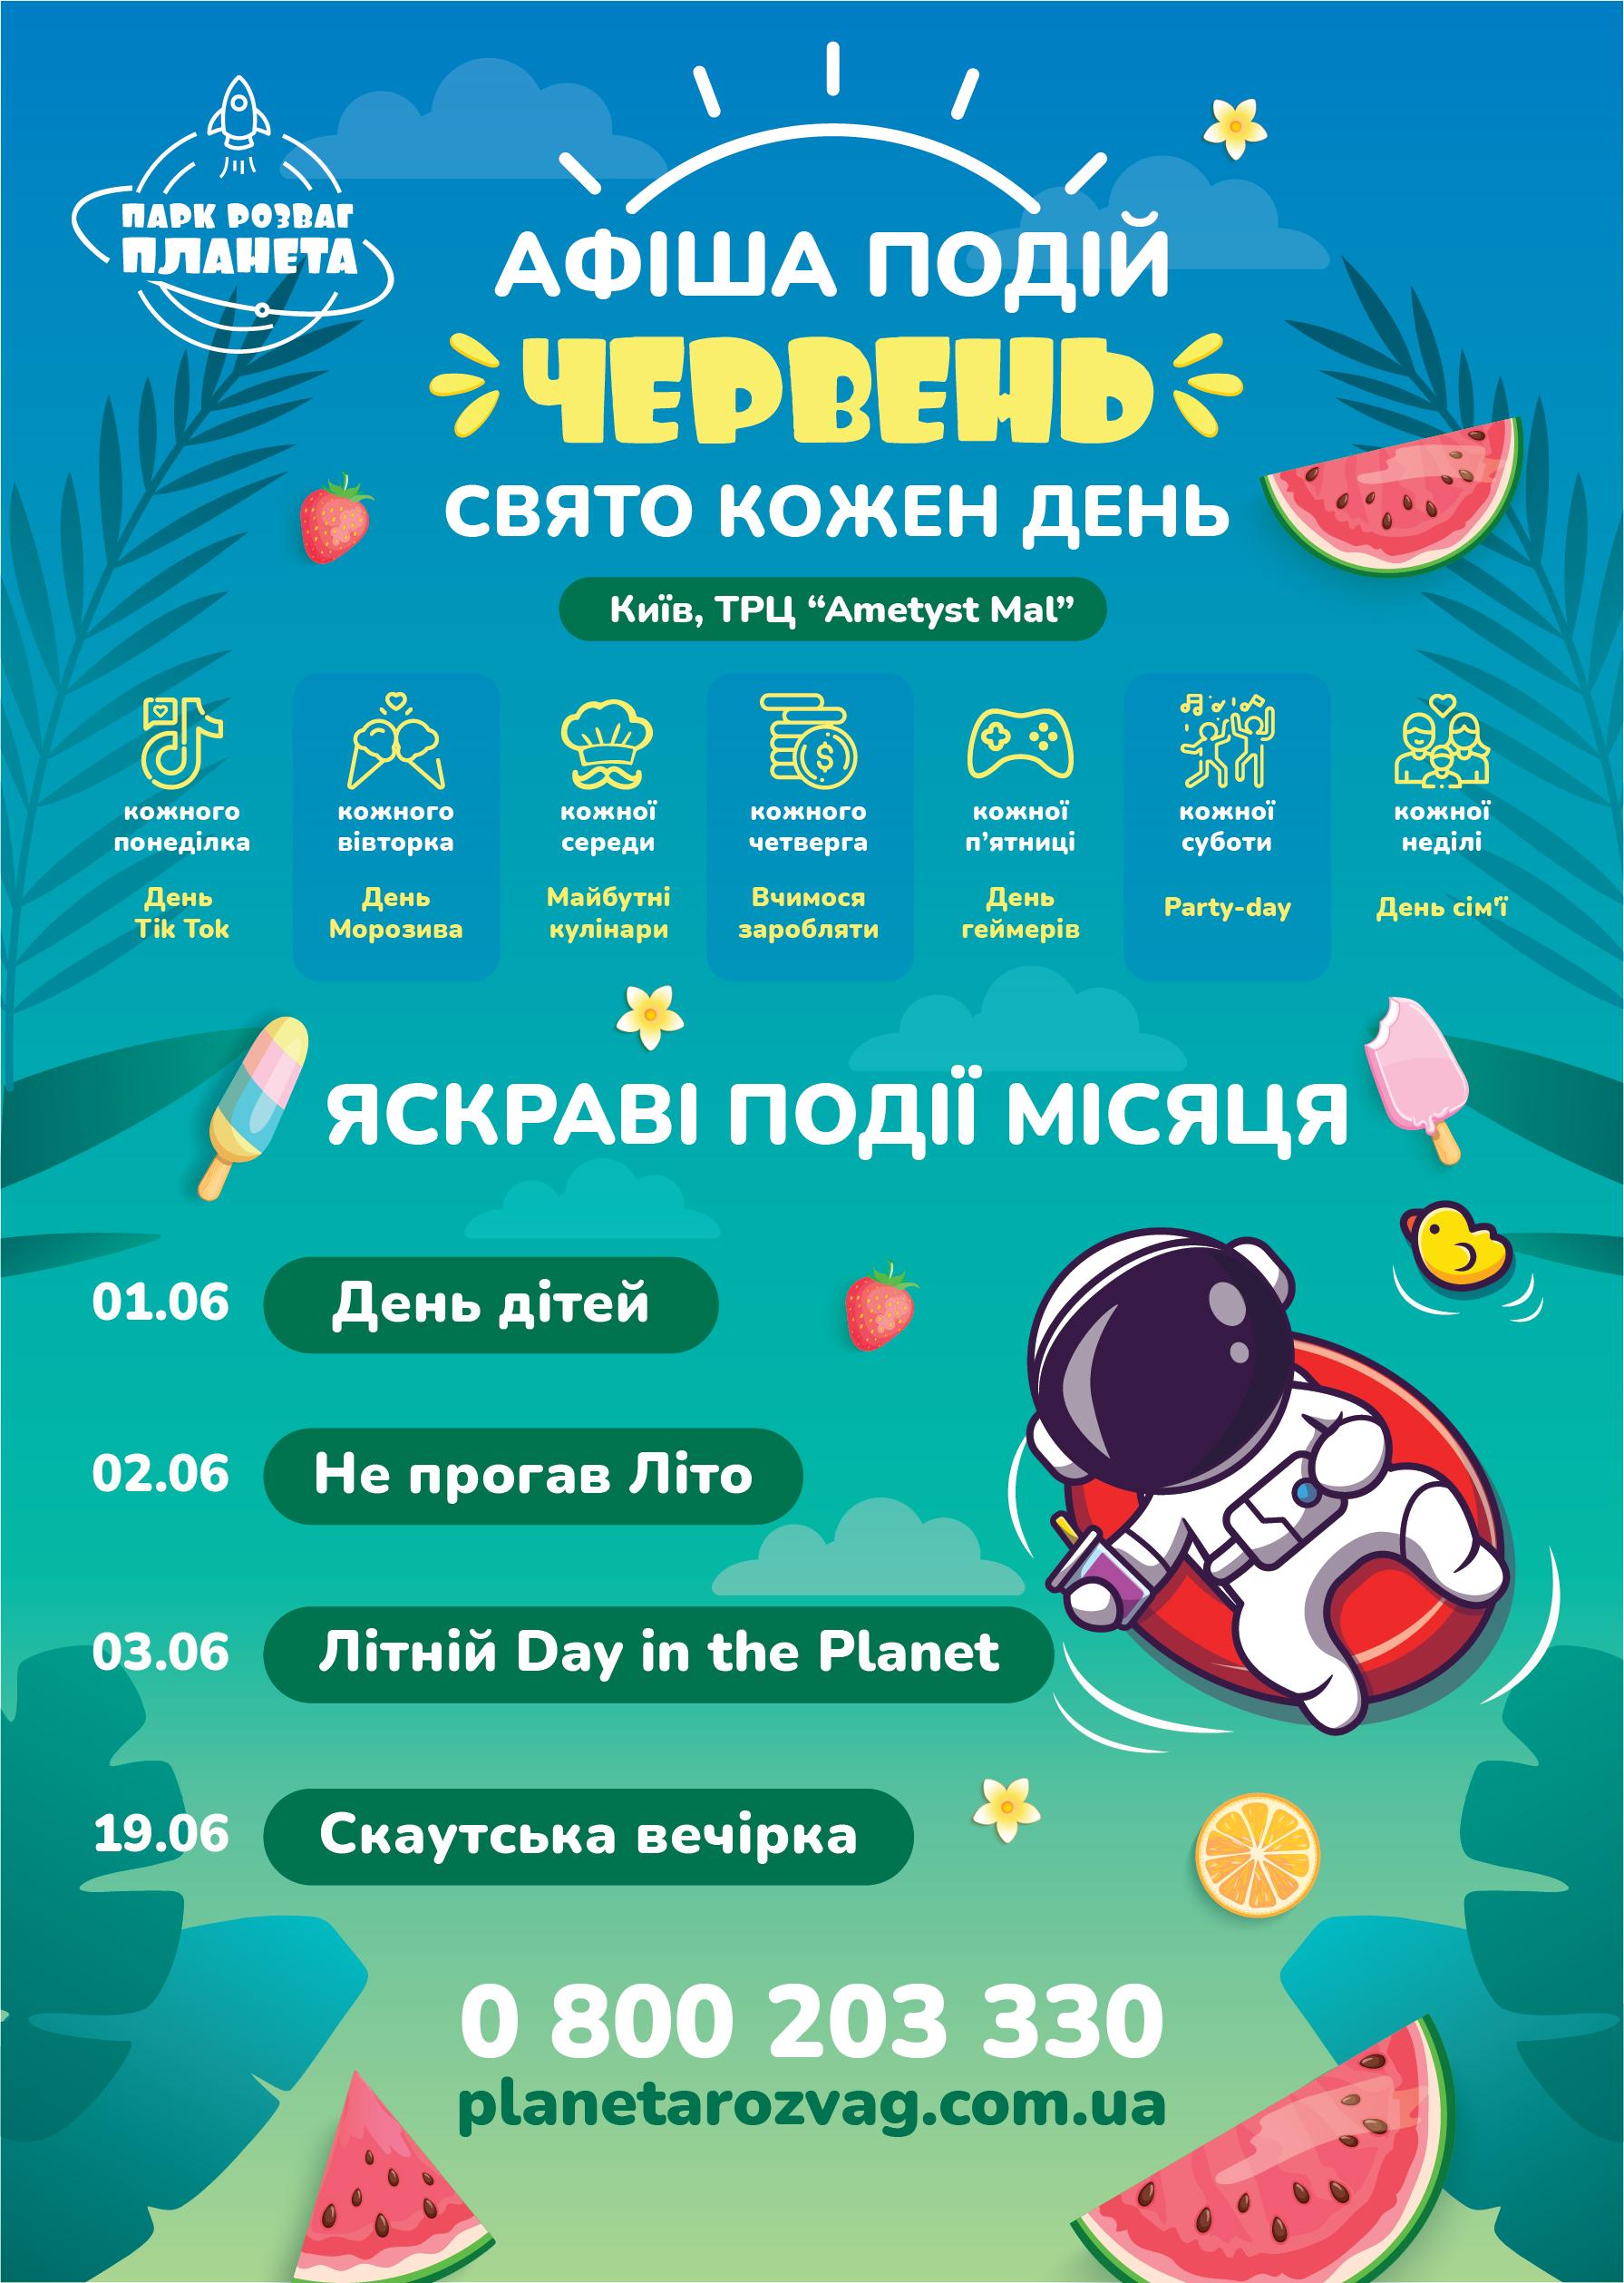 Афіша Києва на червень (ТРЦ Ametyst Mal)